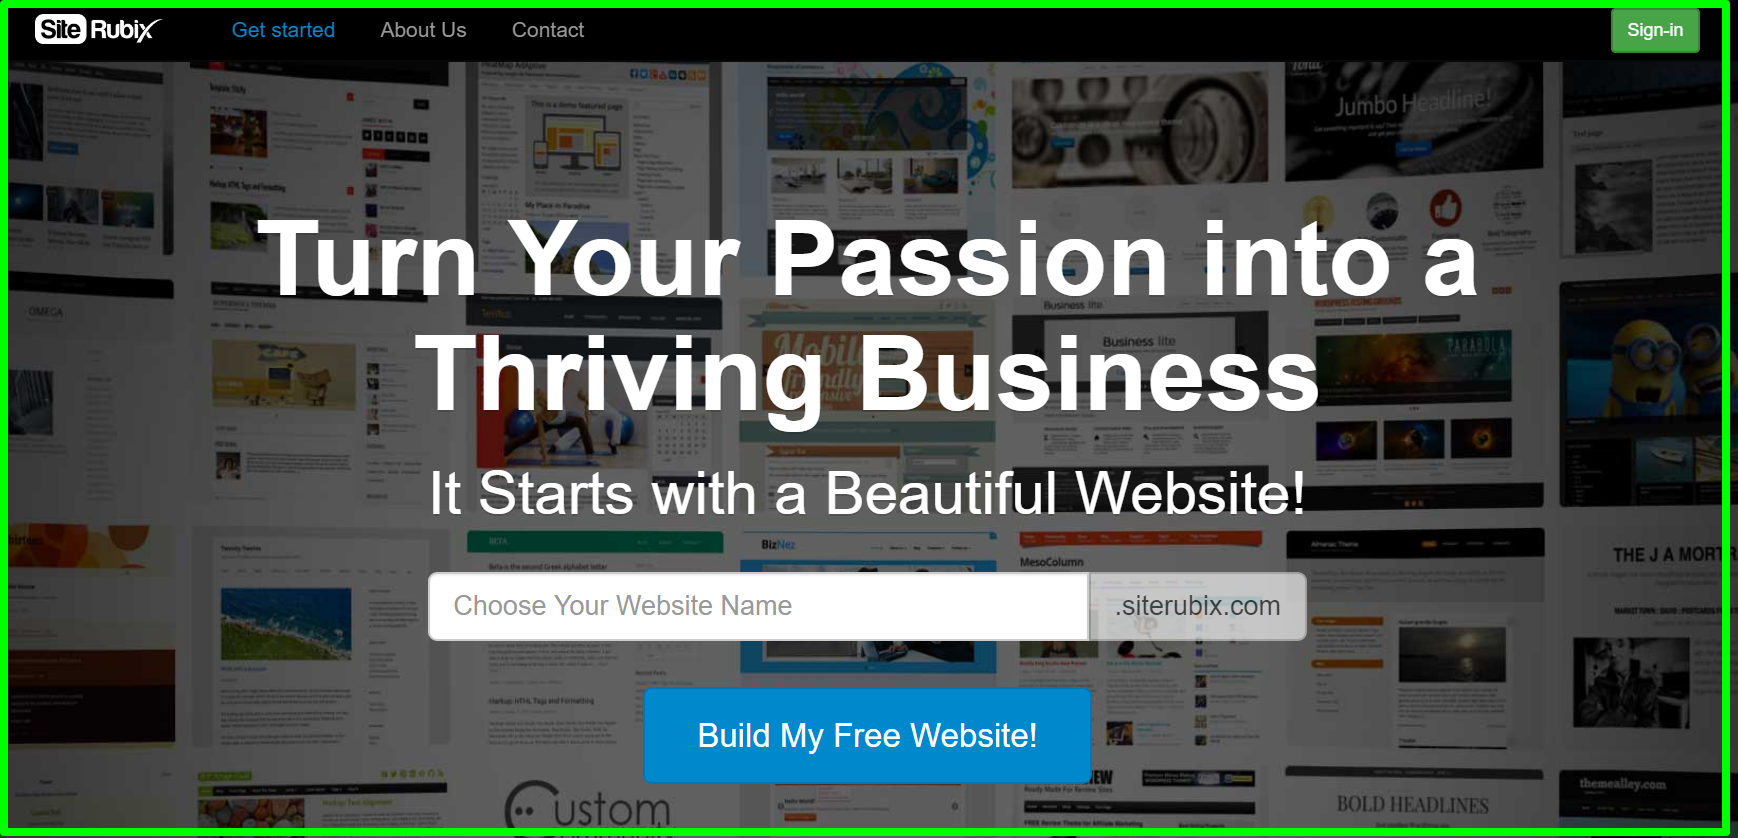 SiteRubix - Build Stunning Free Websites